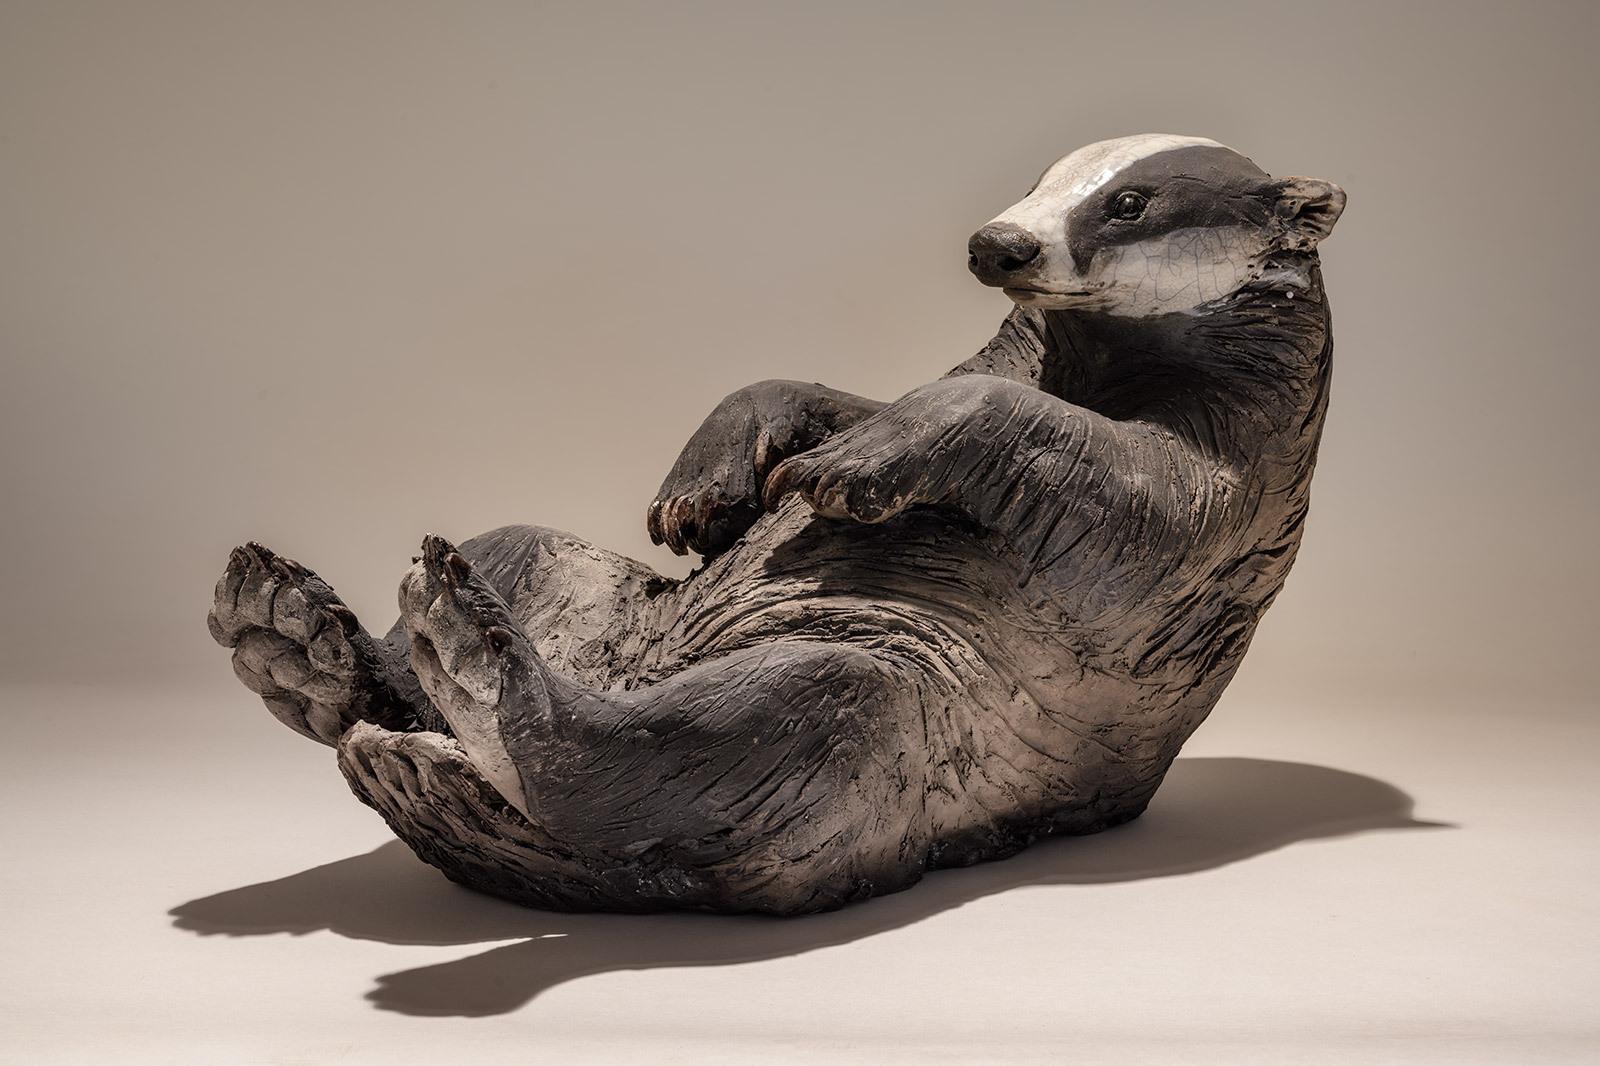 Badger by Nick Mackman